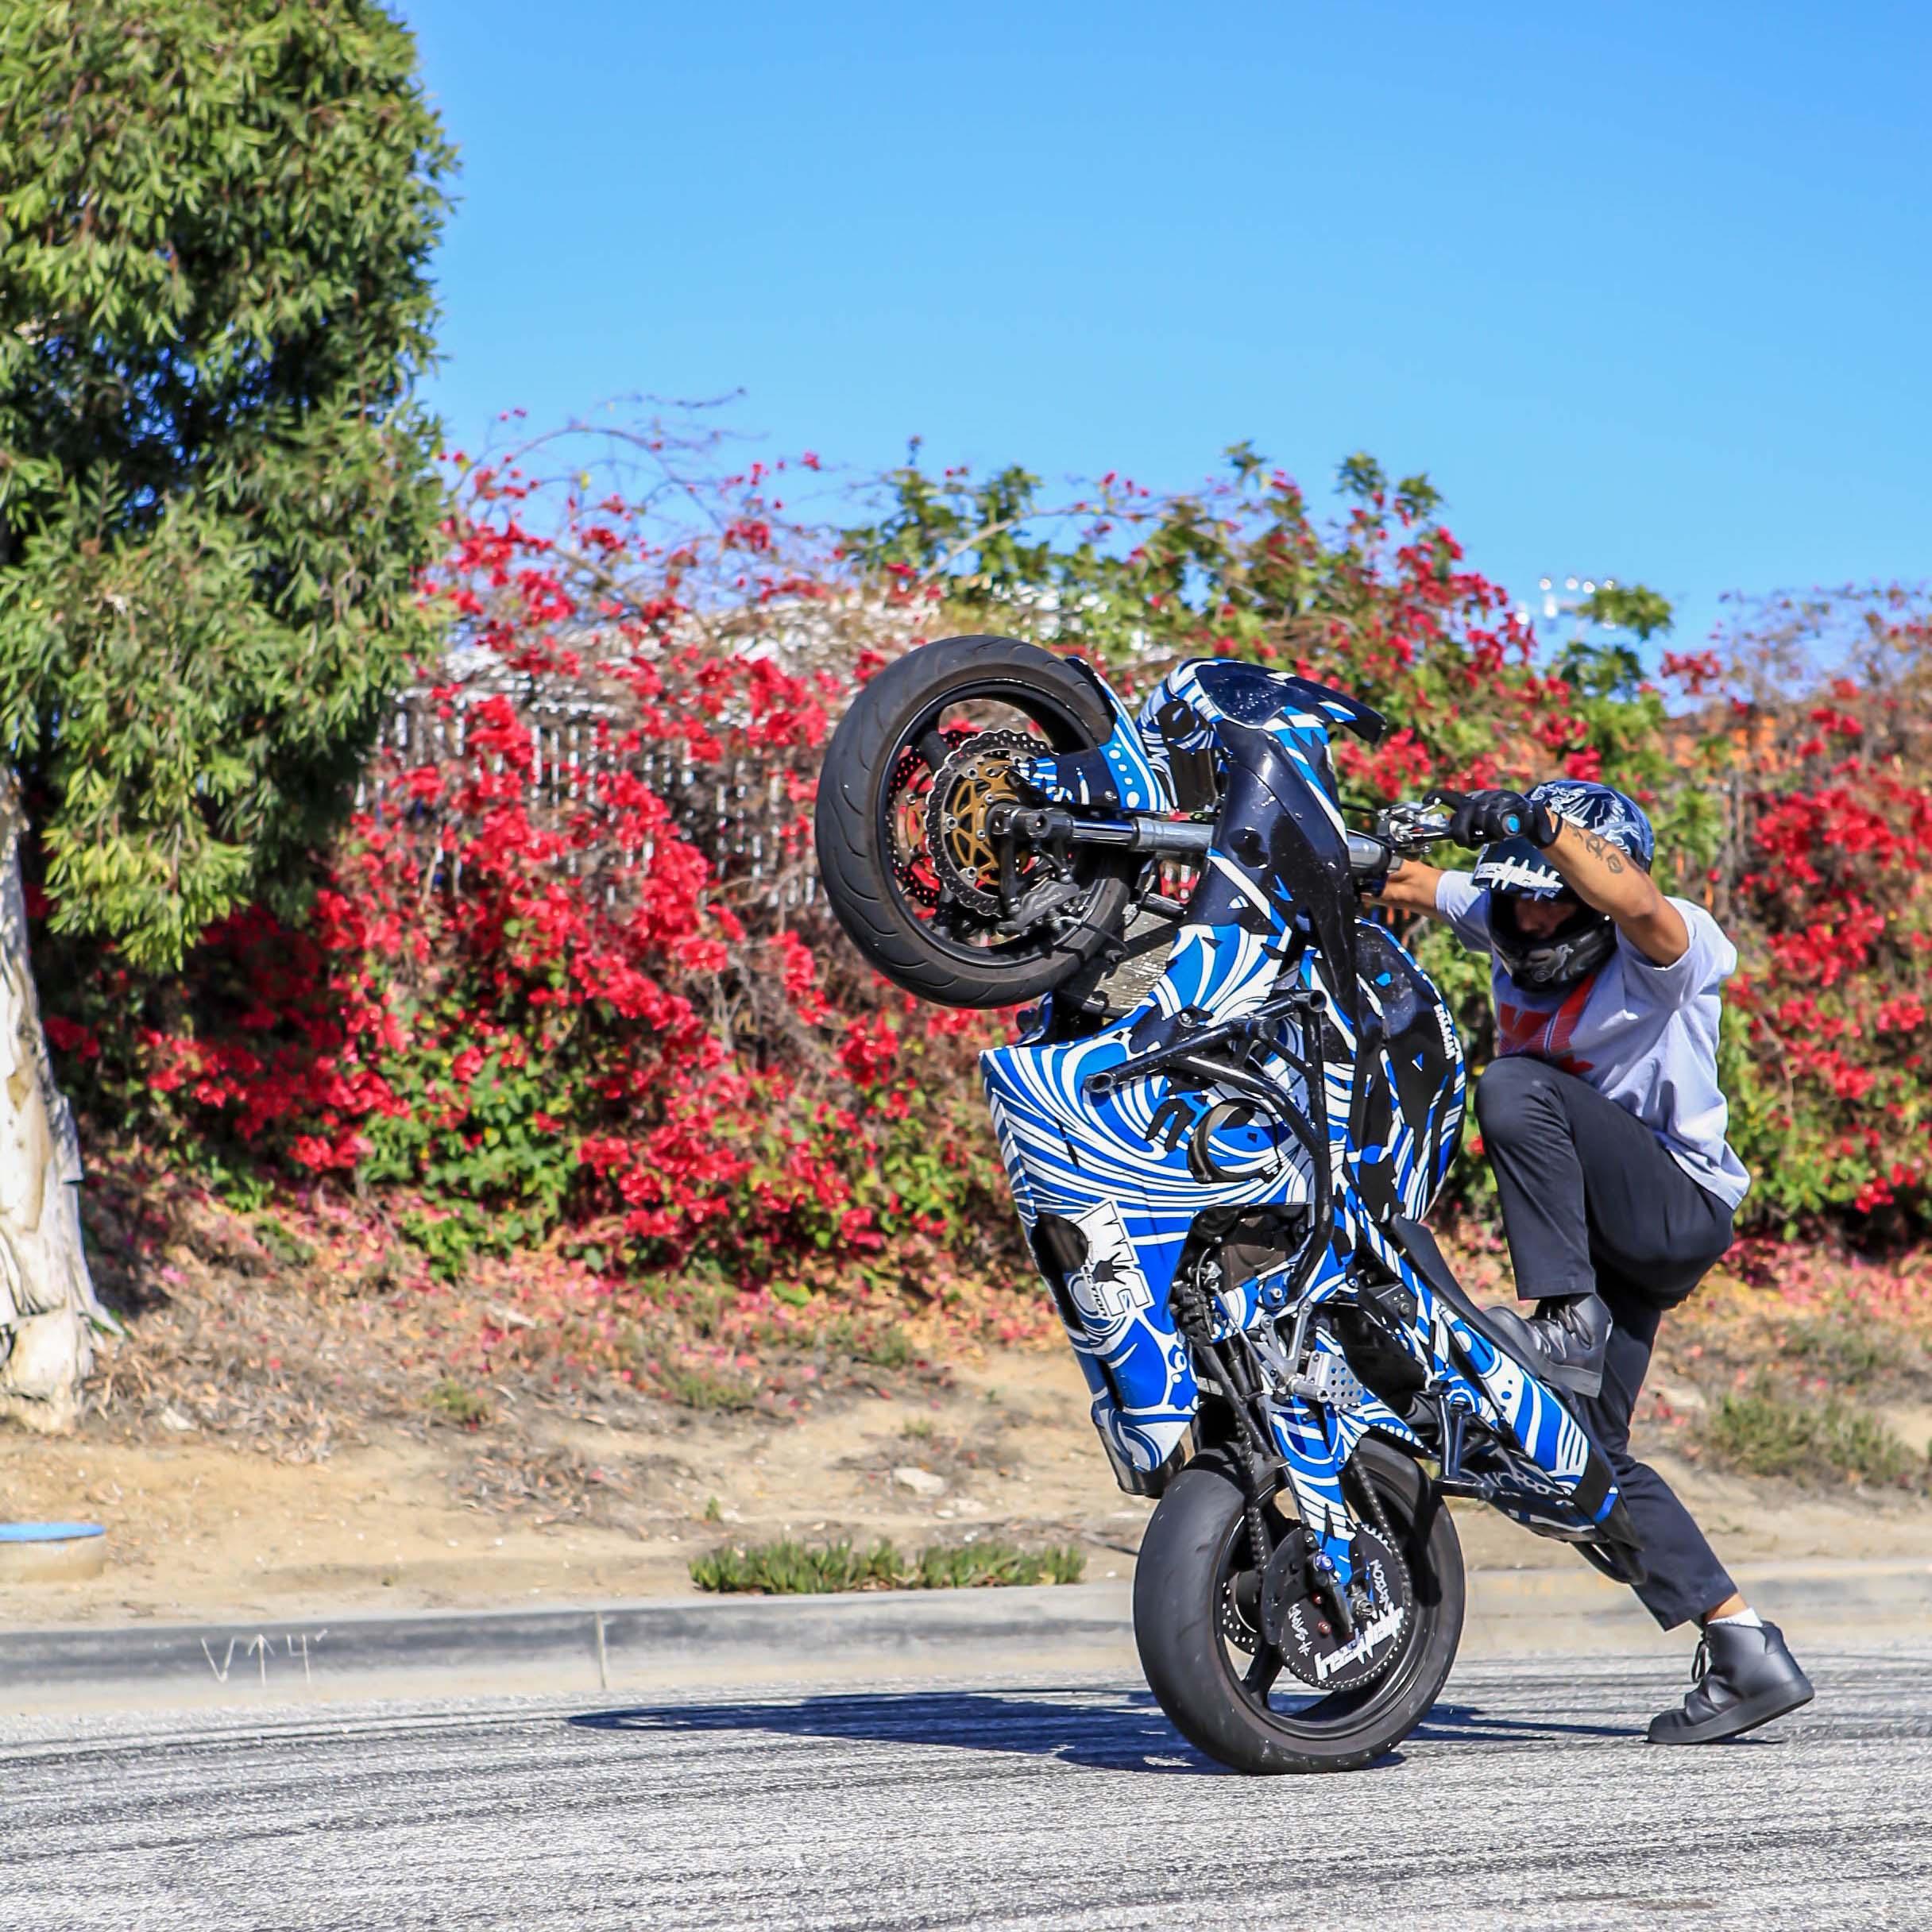 Photo-by-SarahNicole-Photographer_Stunt-Rider.jpg